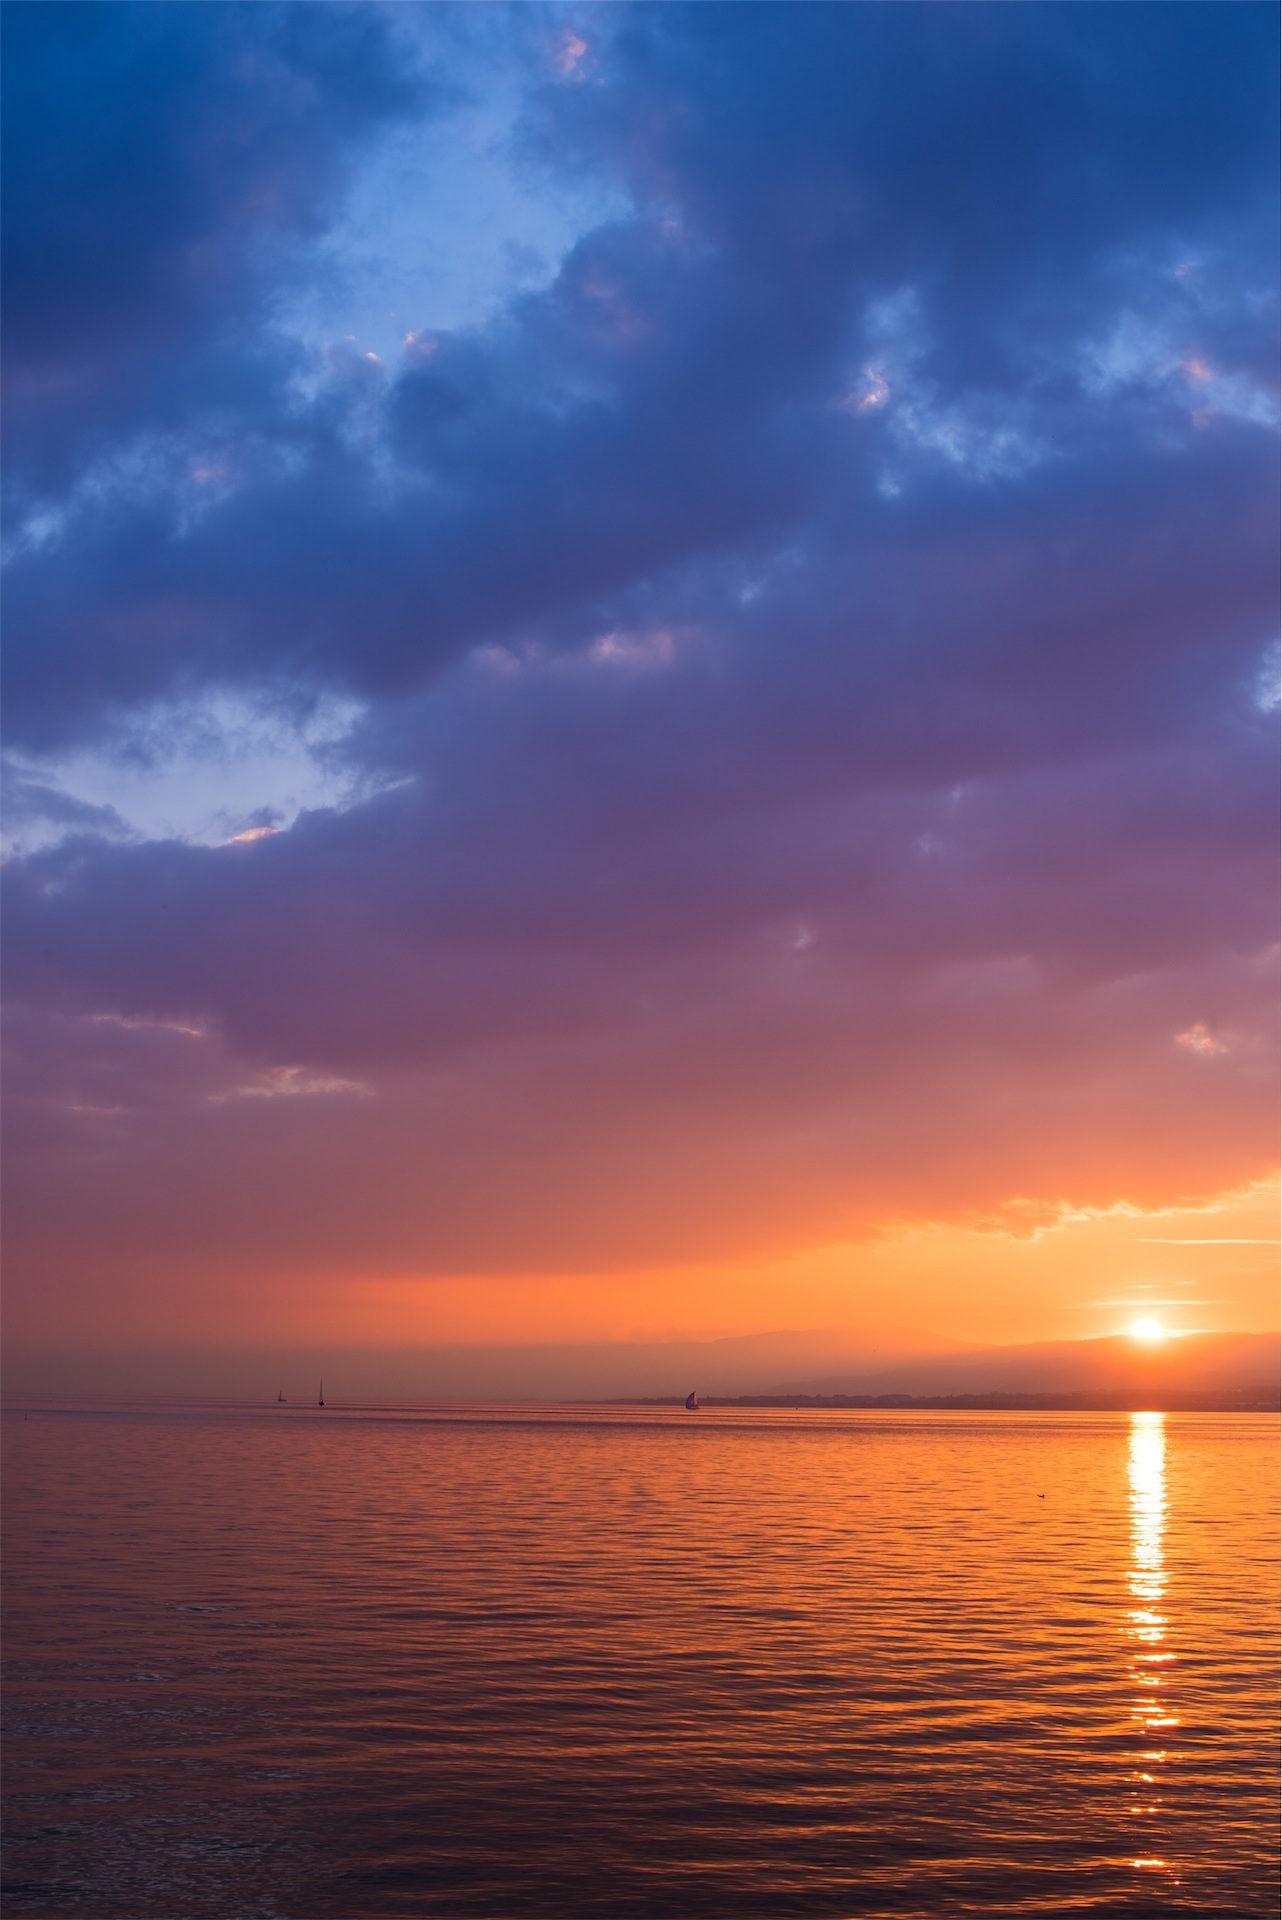 cielo, atardecer, nubes, colorido, mar - Fondos de Pantalla HD - professor-falken.com